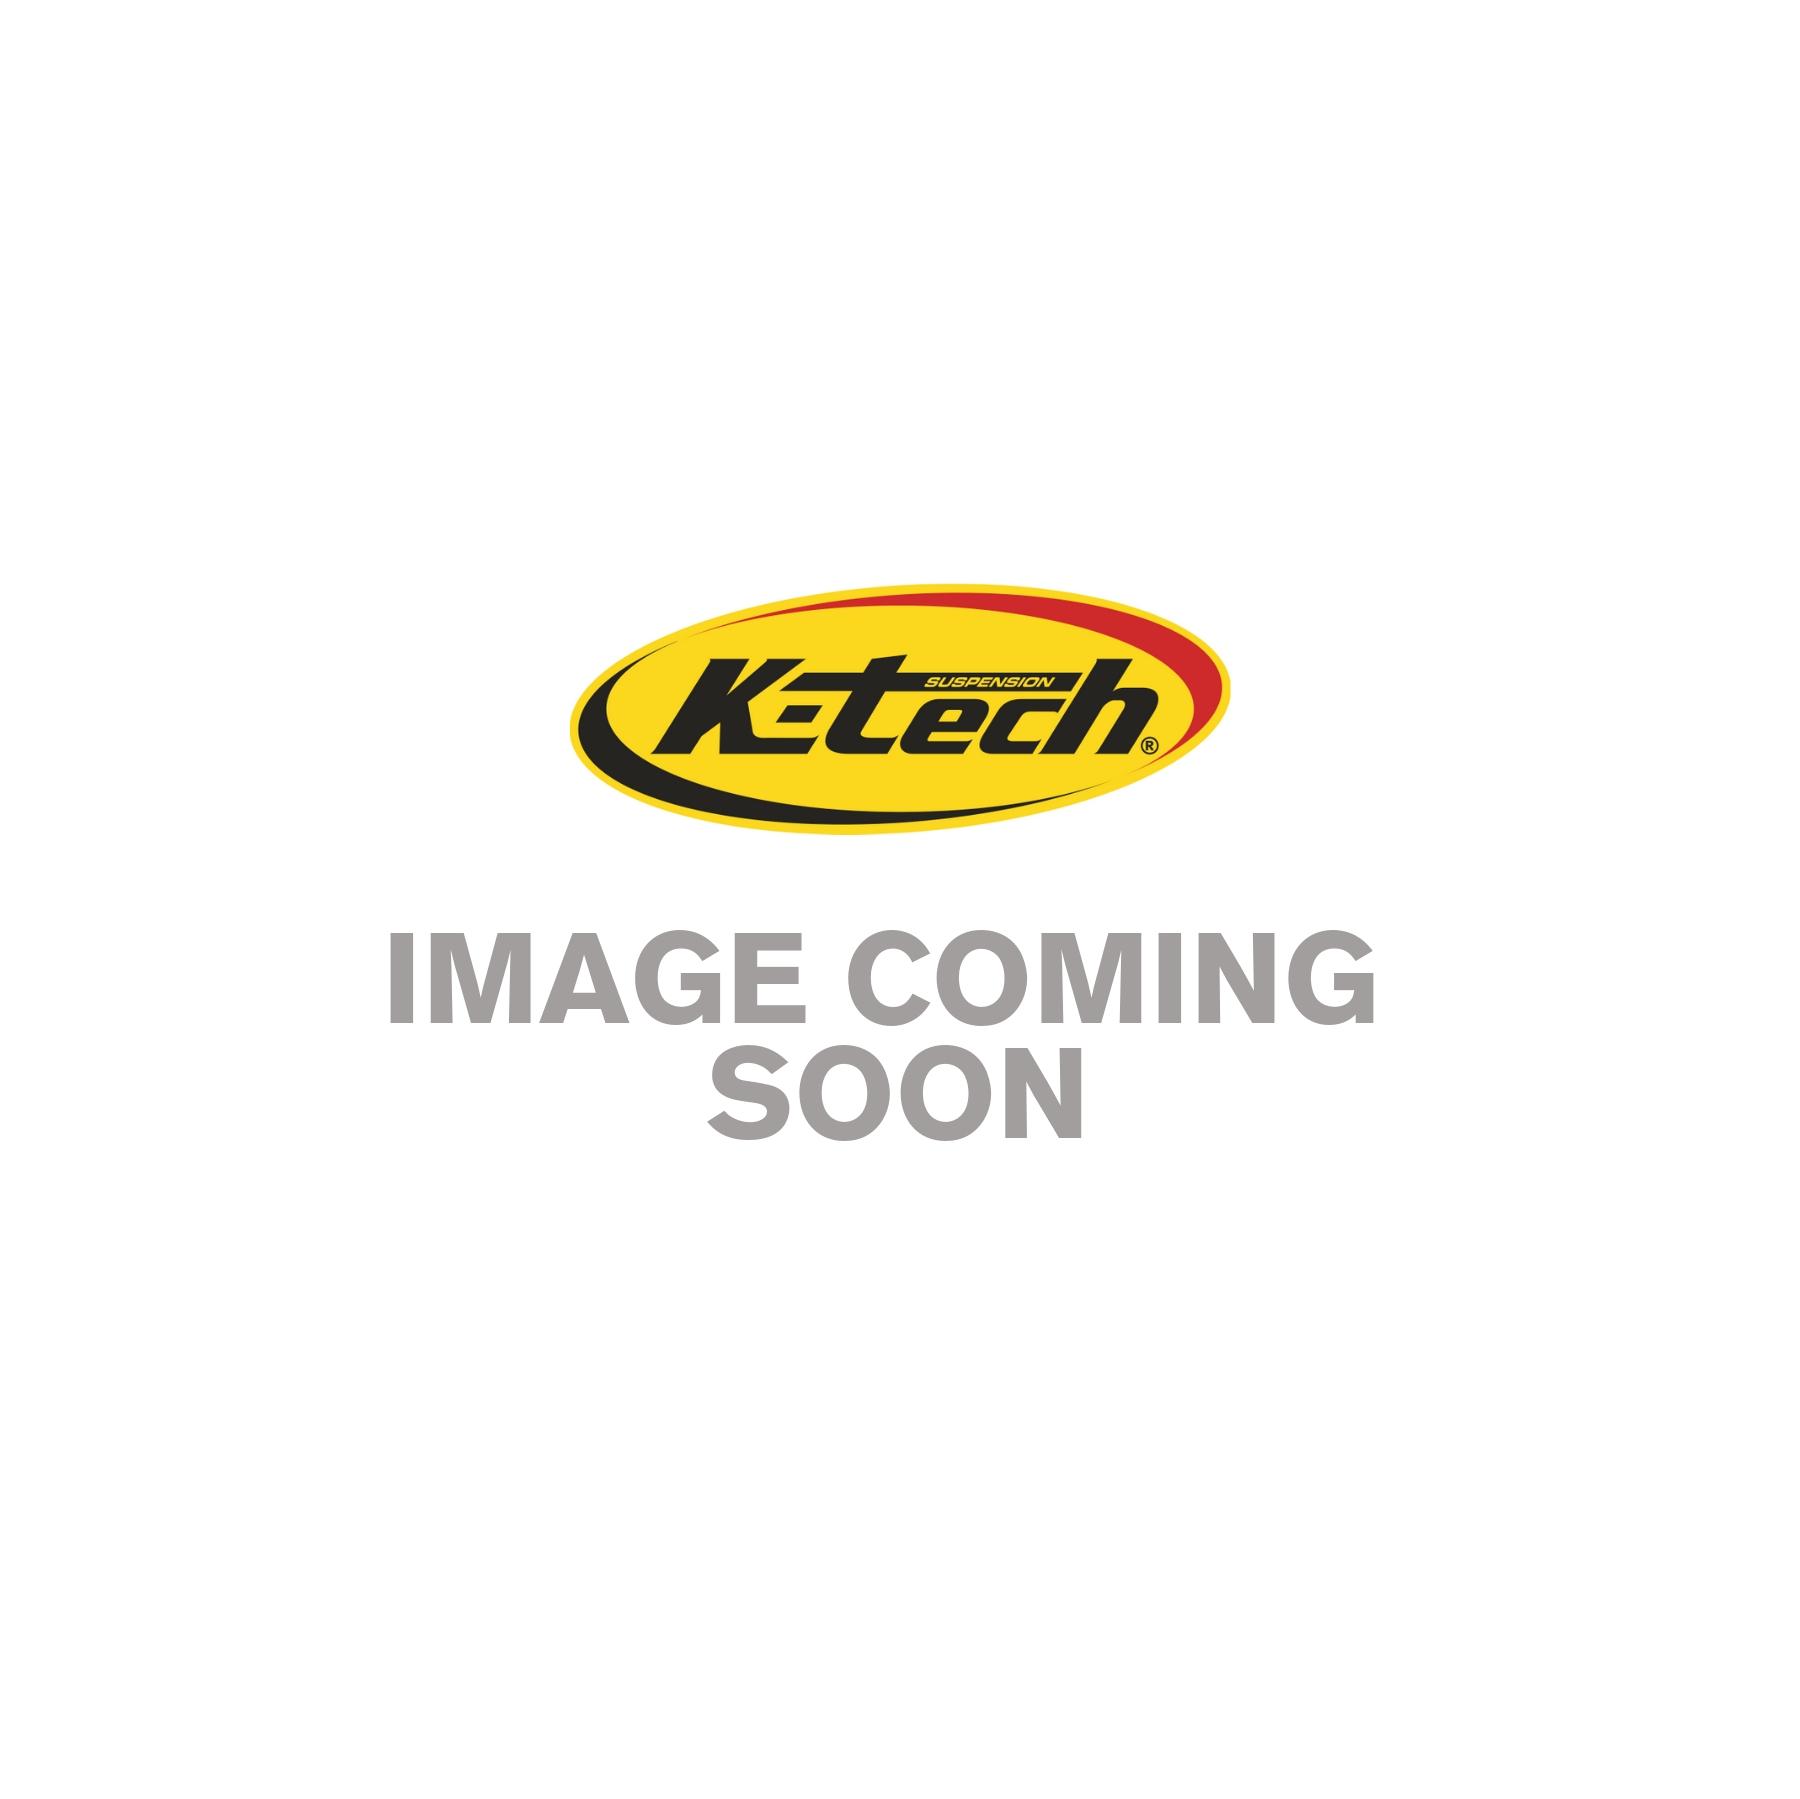 Shock Absorber Piston Rod Lowering Washer (WP XPLOR 12mm) -9mm